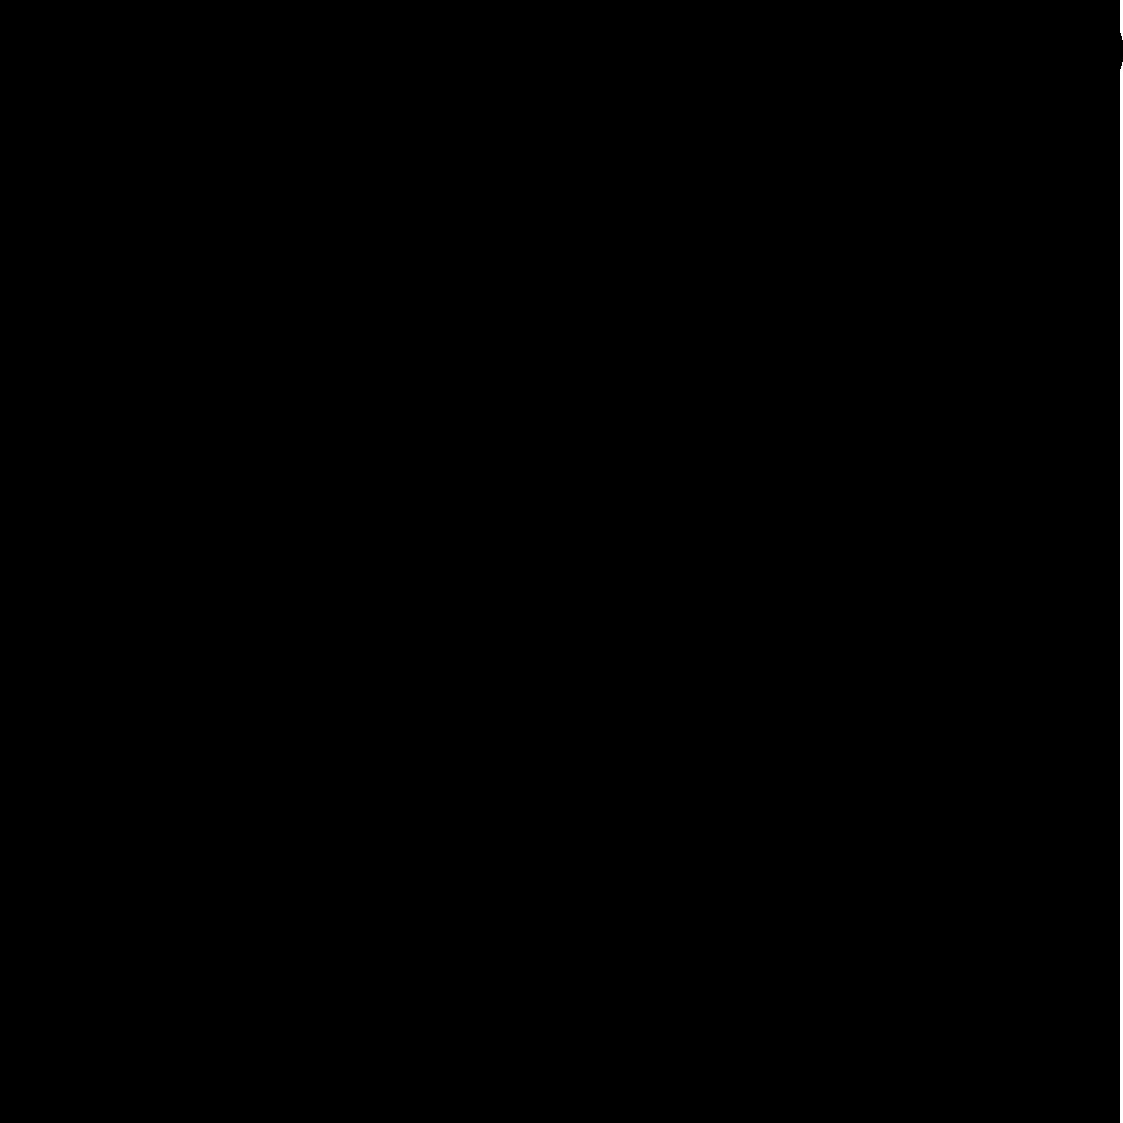 GRAPH-CROP-black.png